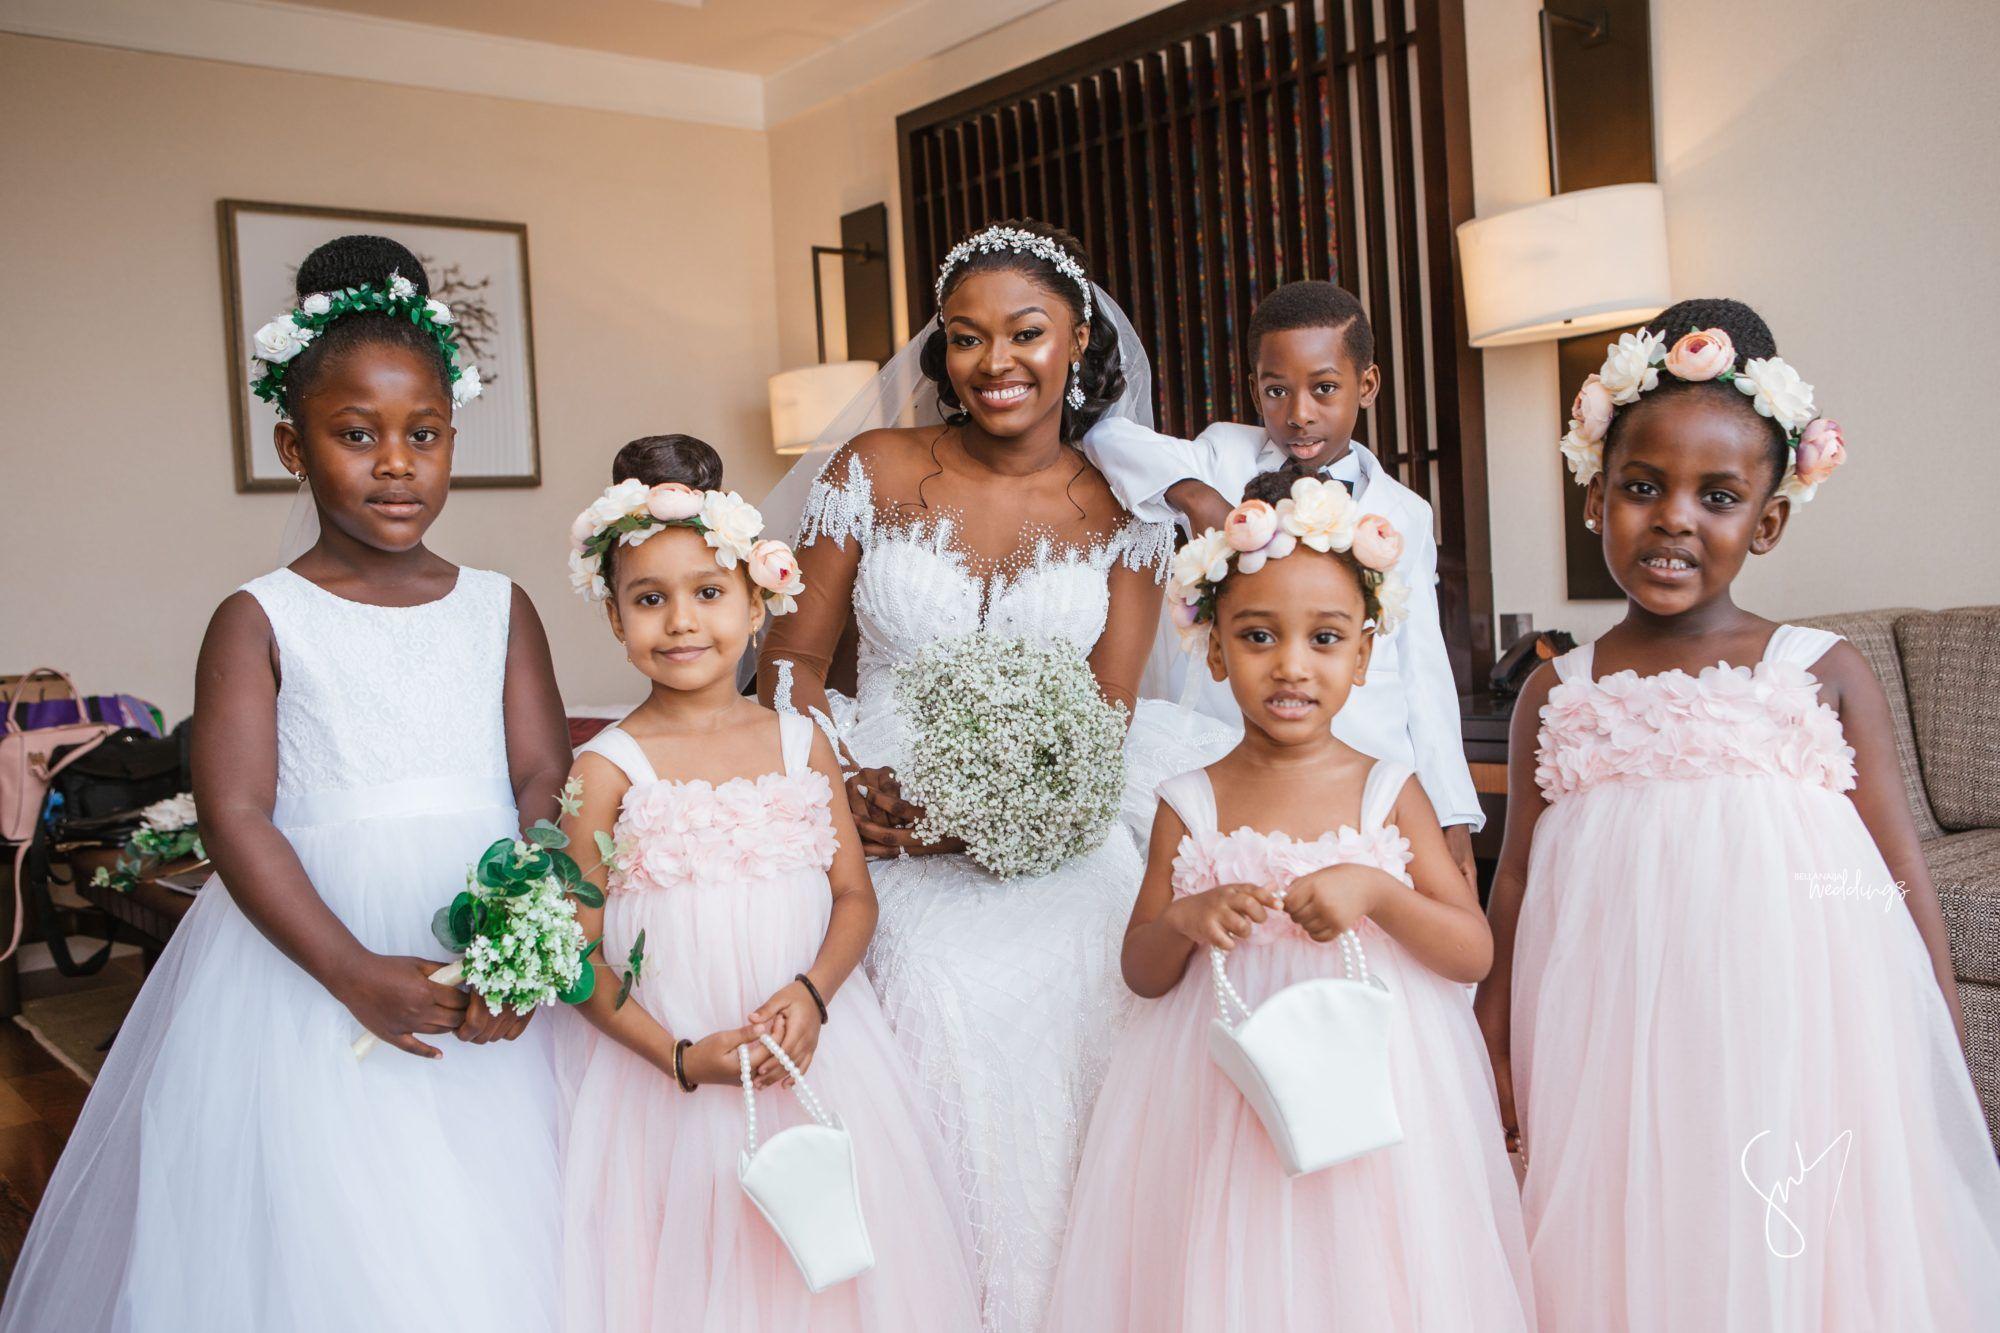 Amanda Sydney S Outdoor White Wedding In Ghana Is Goals In 2020 White Wedding Ceremony White Wedding Ghanaian Wedding